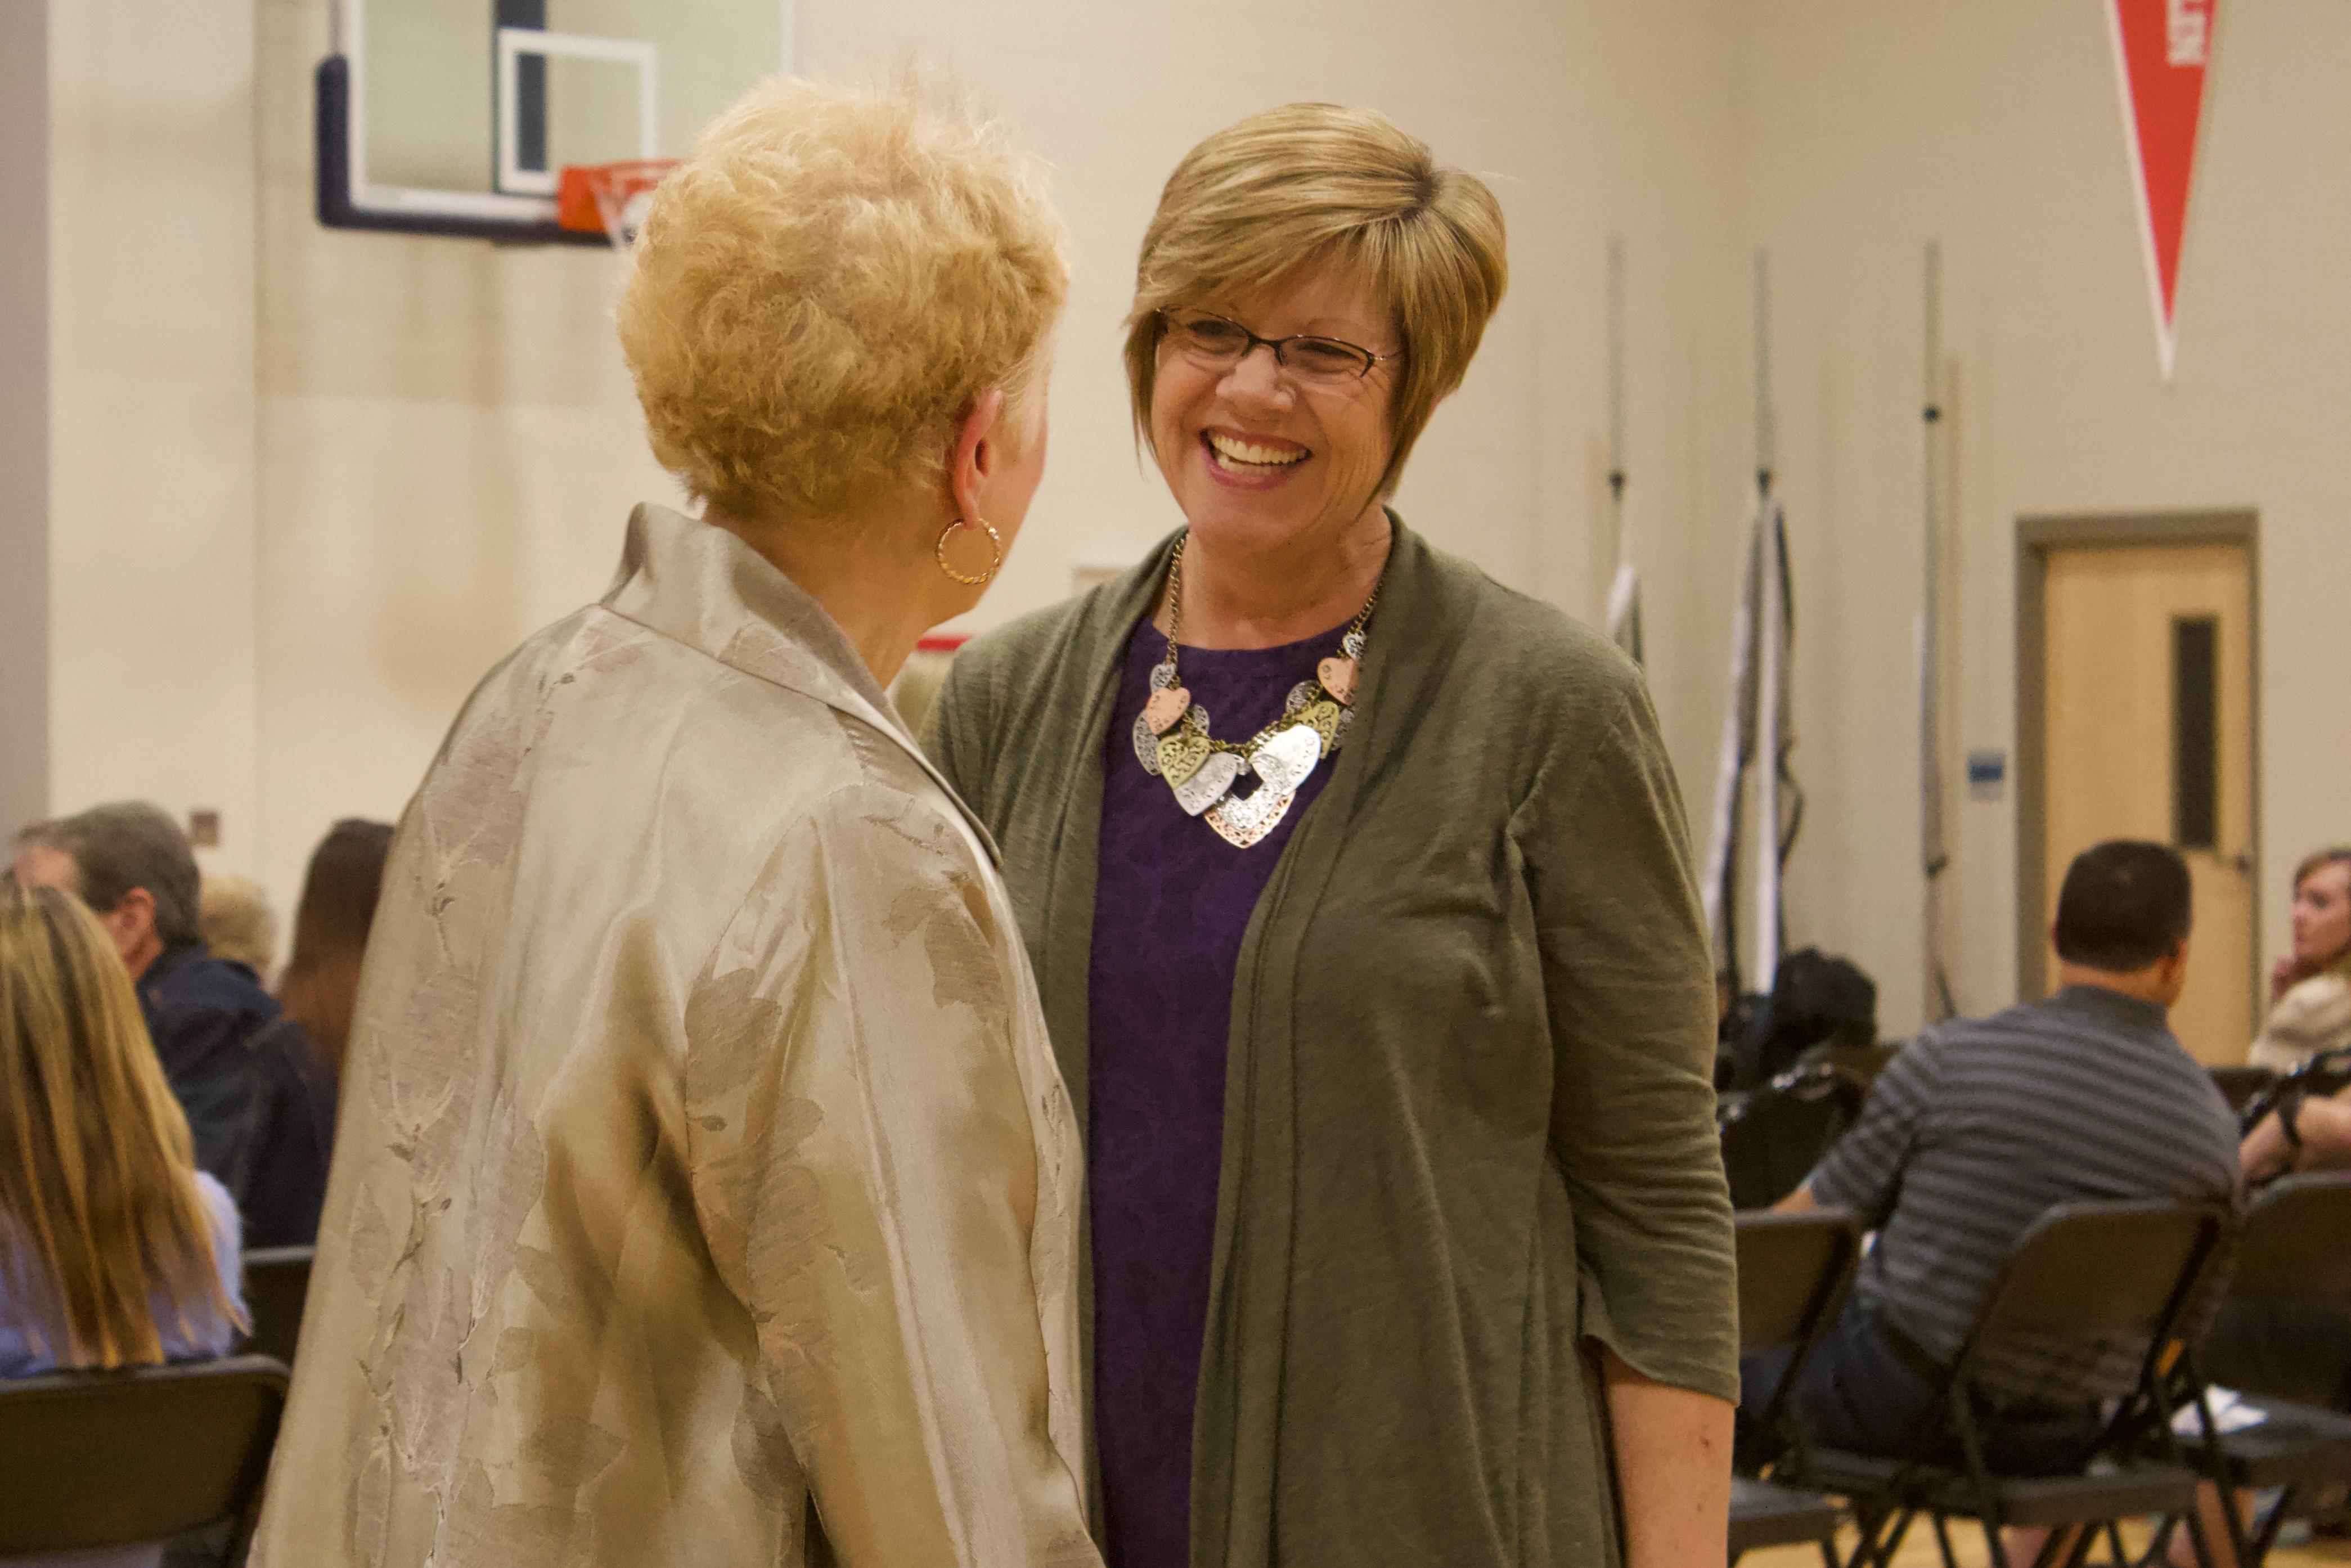 Pam Mazanec, right, greets former state board member Debora Scheffel at a Douglas County school board forum in November 2017. (Photo by Nic Garcia)